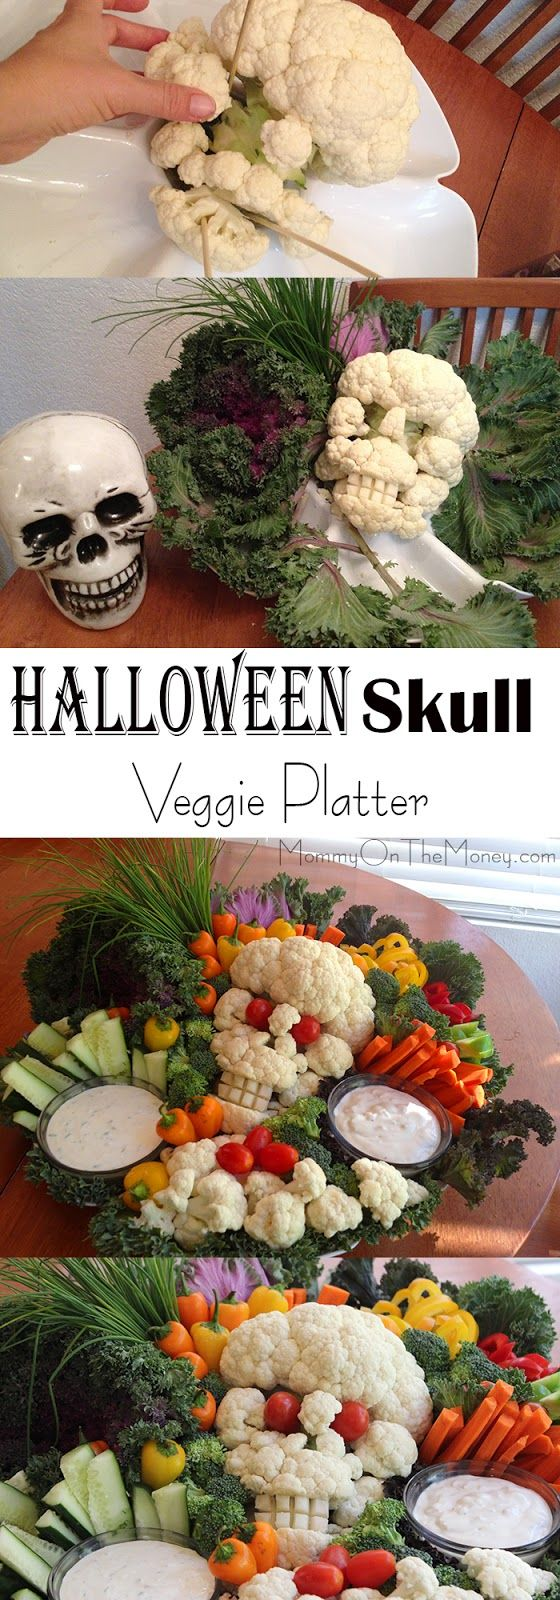 how to make a veggie platter